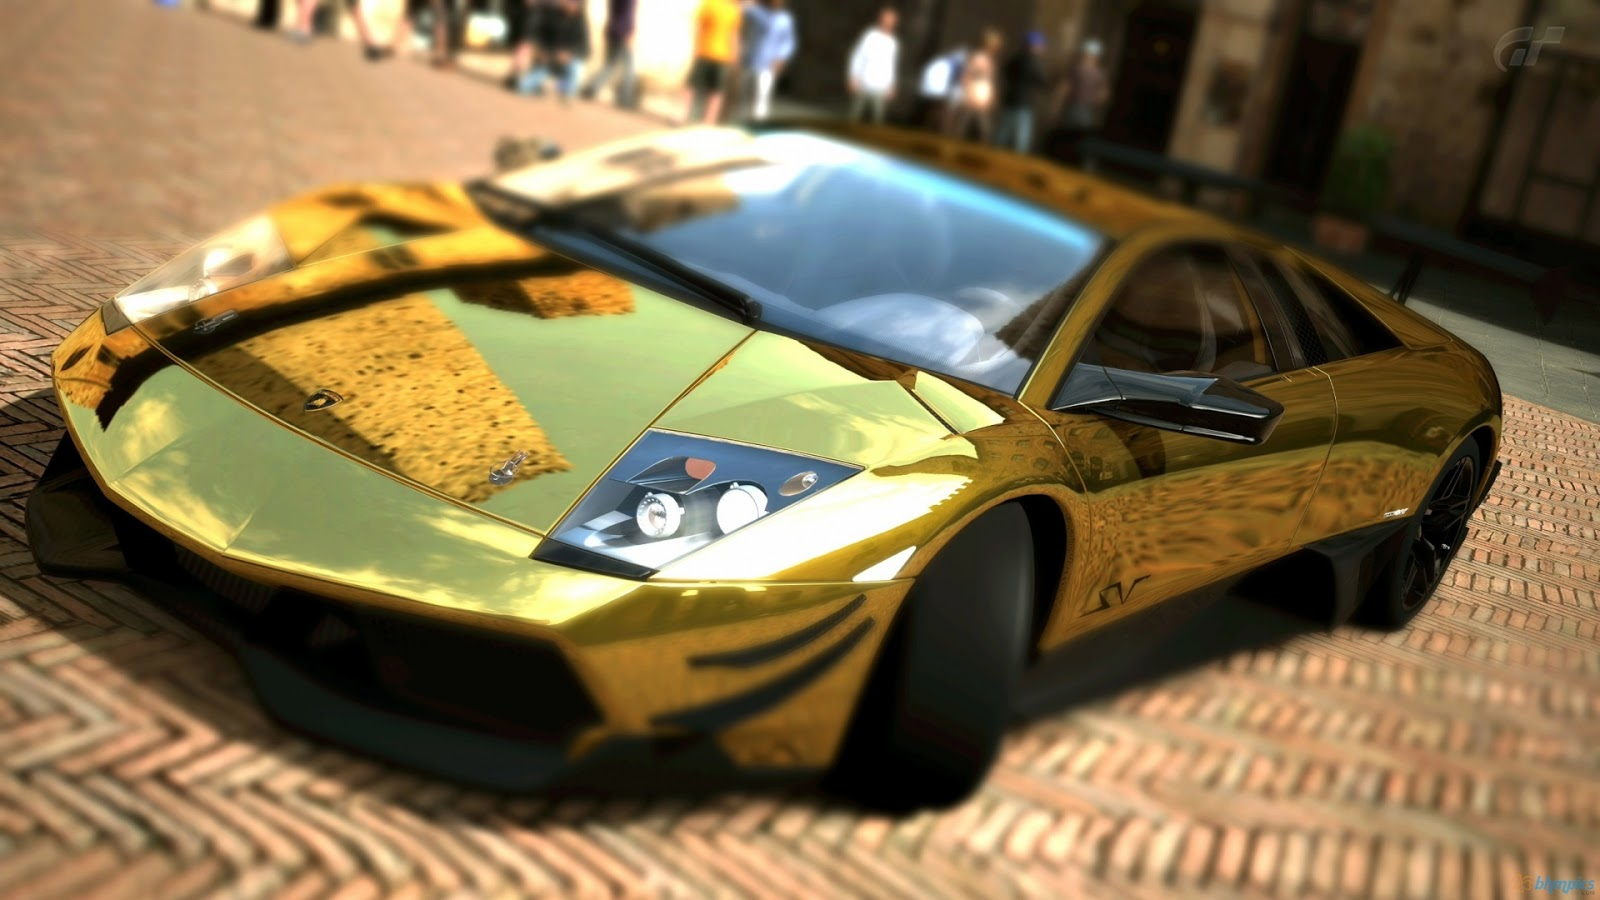 Garrett S Lamborghinis July 2013